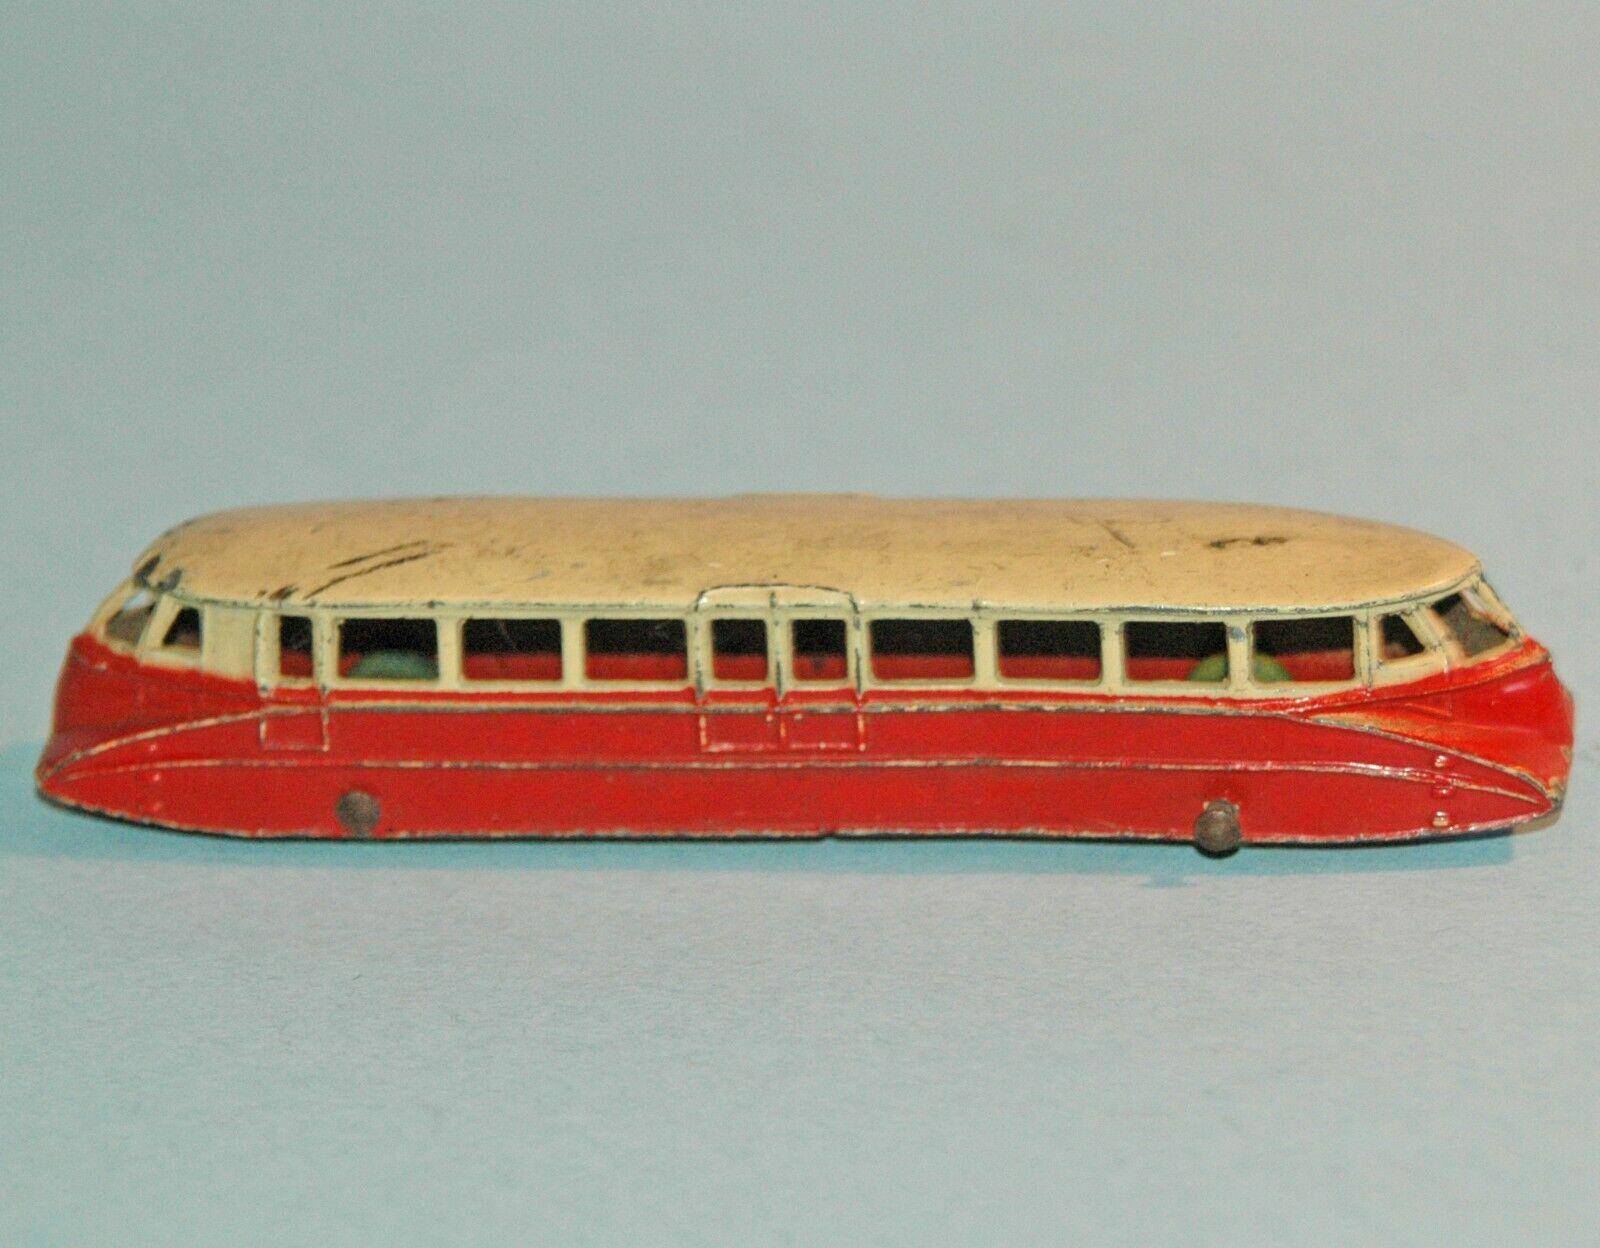 DINKY giocattoli MECCANO ENGLe  26 Great Western Railstrada aerodinamico FERROVIA AUTO 1937